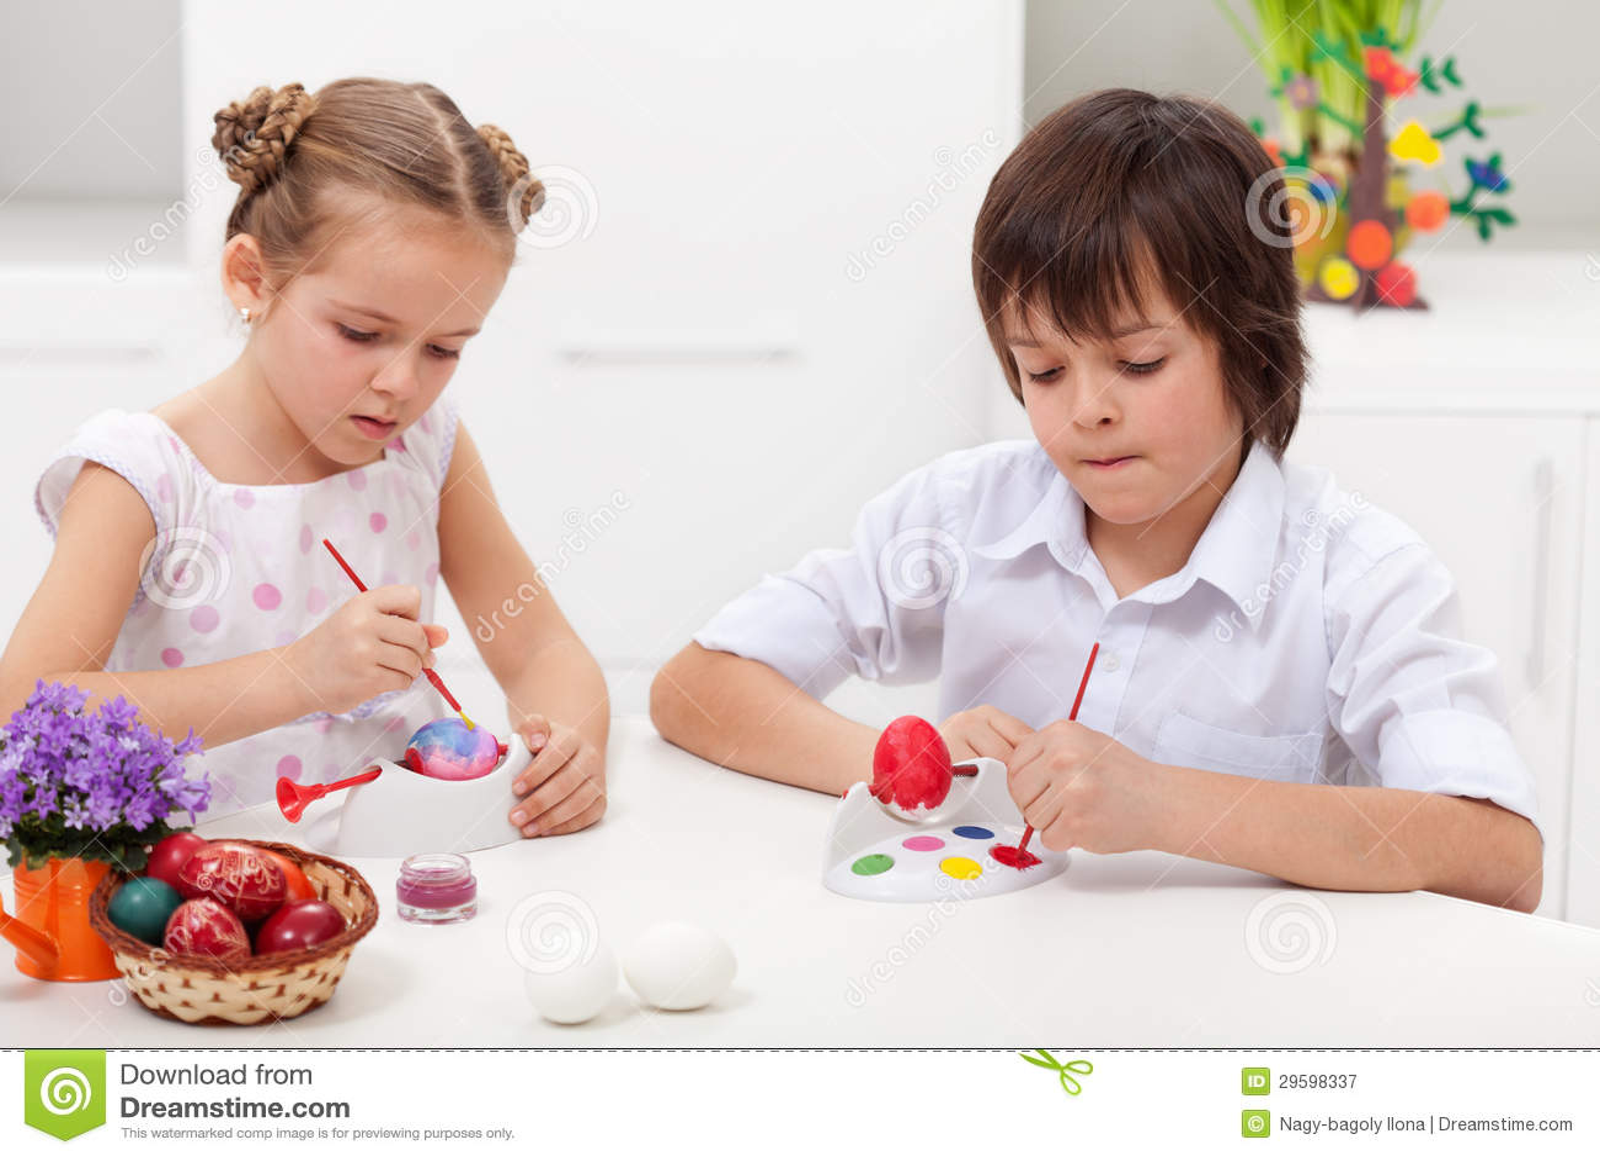 Schilderen kind jongen maison design risofu